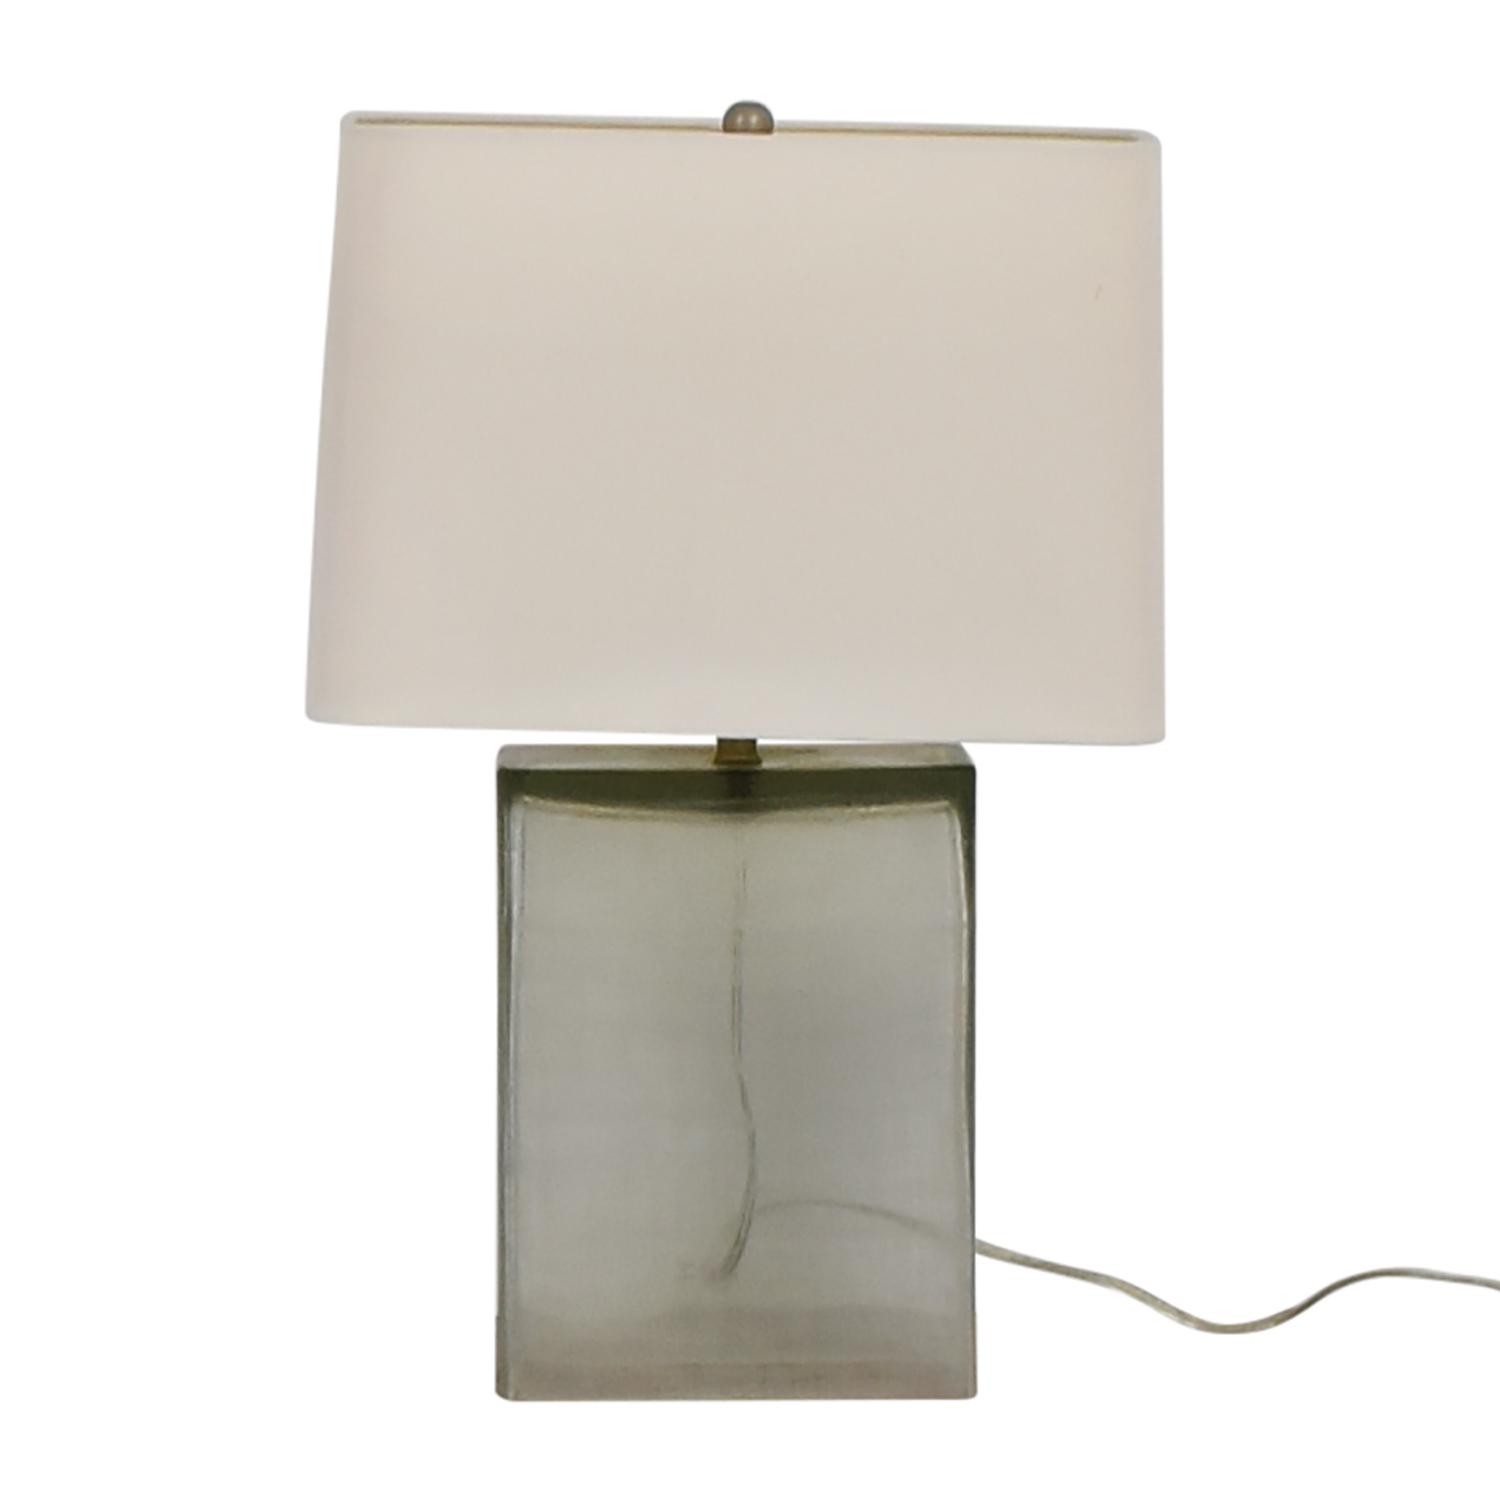 Crate & Barrel Crate & Barrel Meier Table Lamp for sale